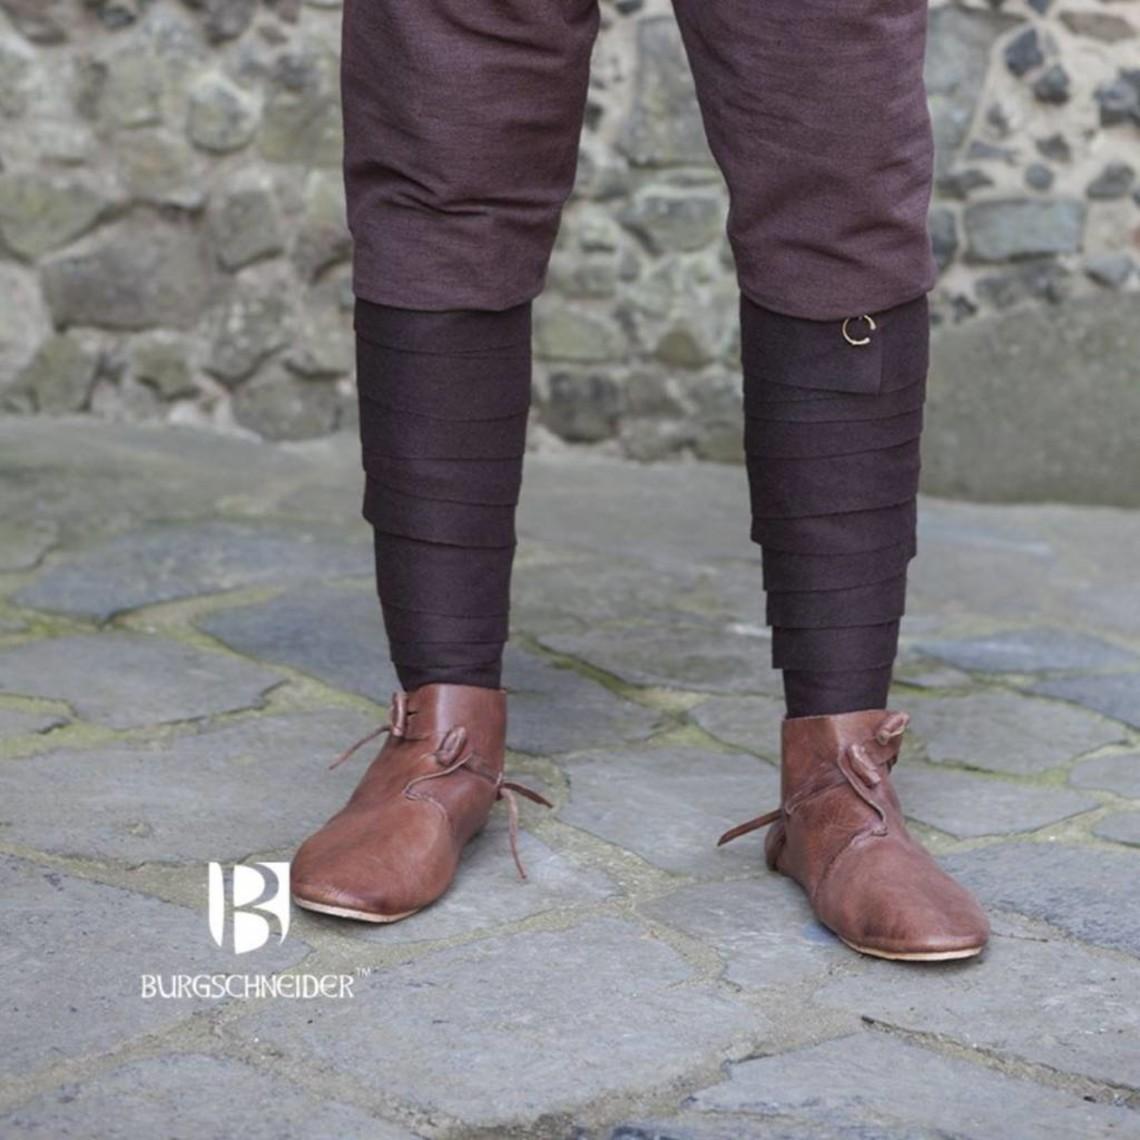 Burgschneider Beenwindsels Aki, bruin